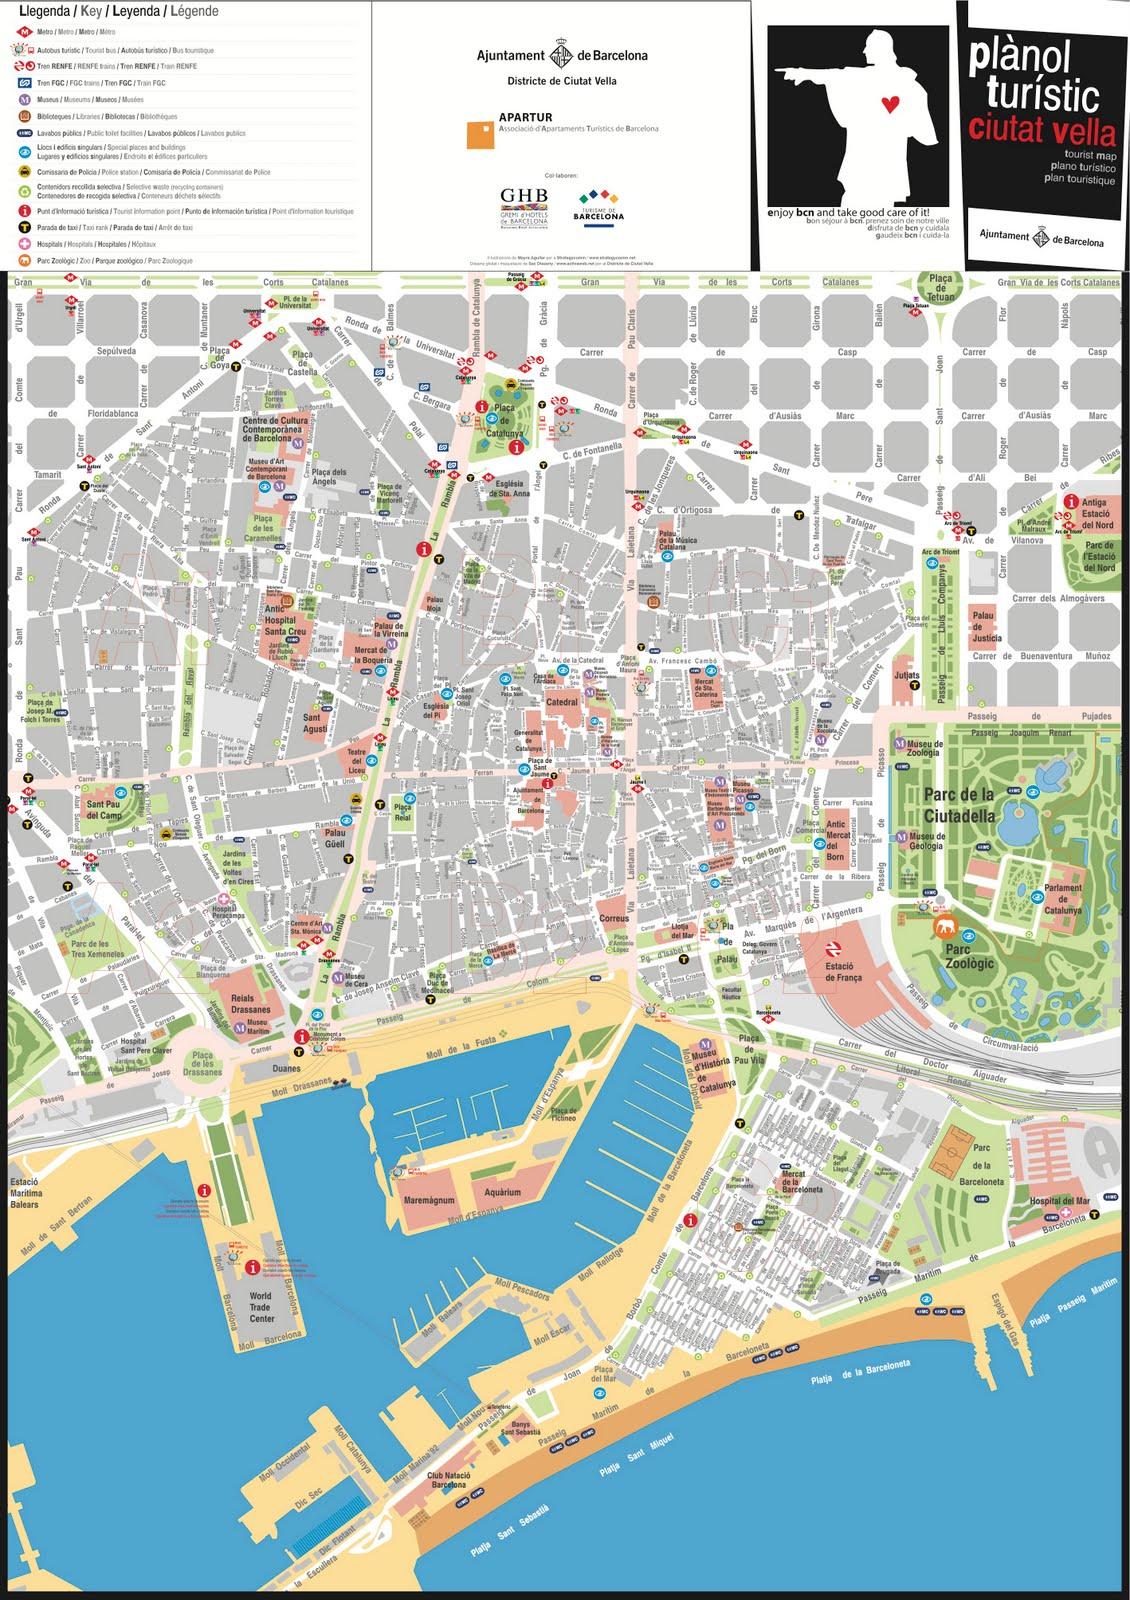 detail bcn tourist map barcelona20